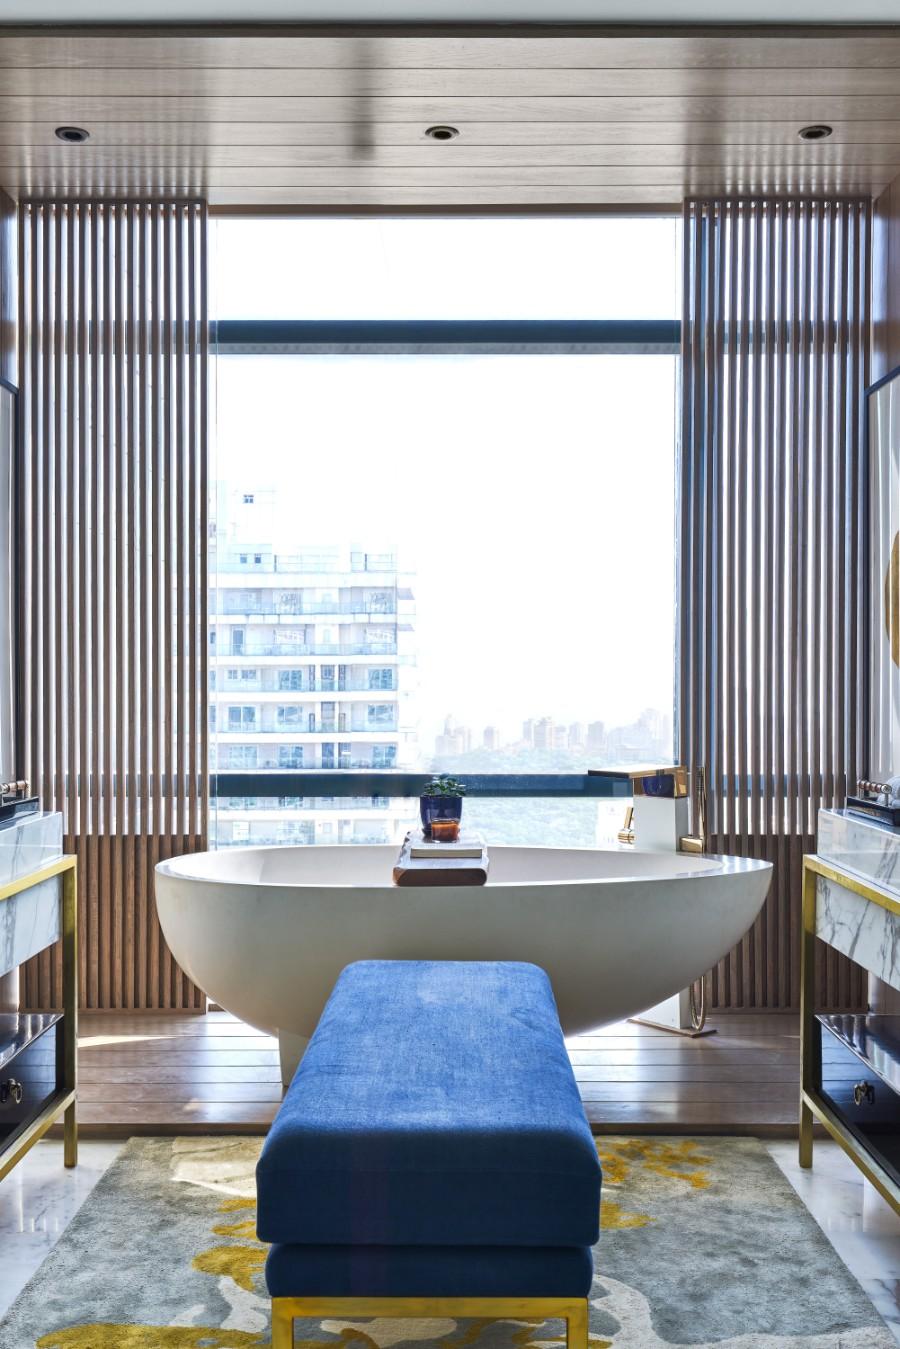 exclusive design Exclusive Design: Altamount Residence by Hirsch Bedner Associates Inside Altamount Residence by Hirsch Bedner Associates 20